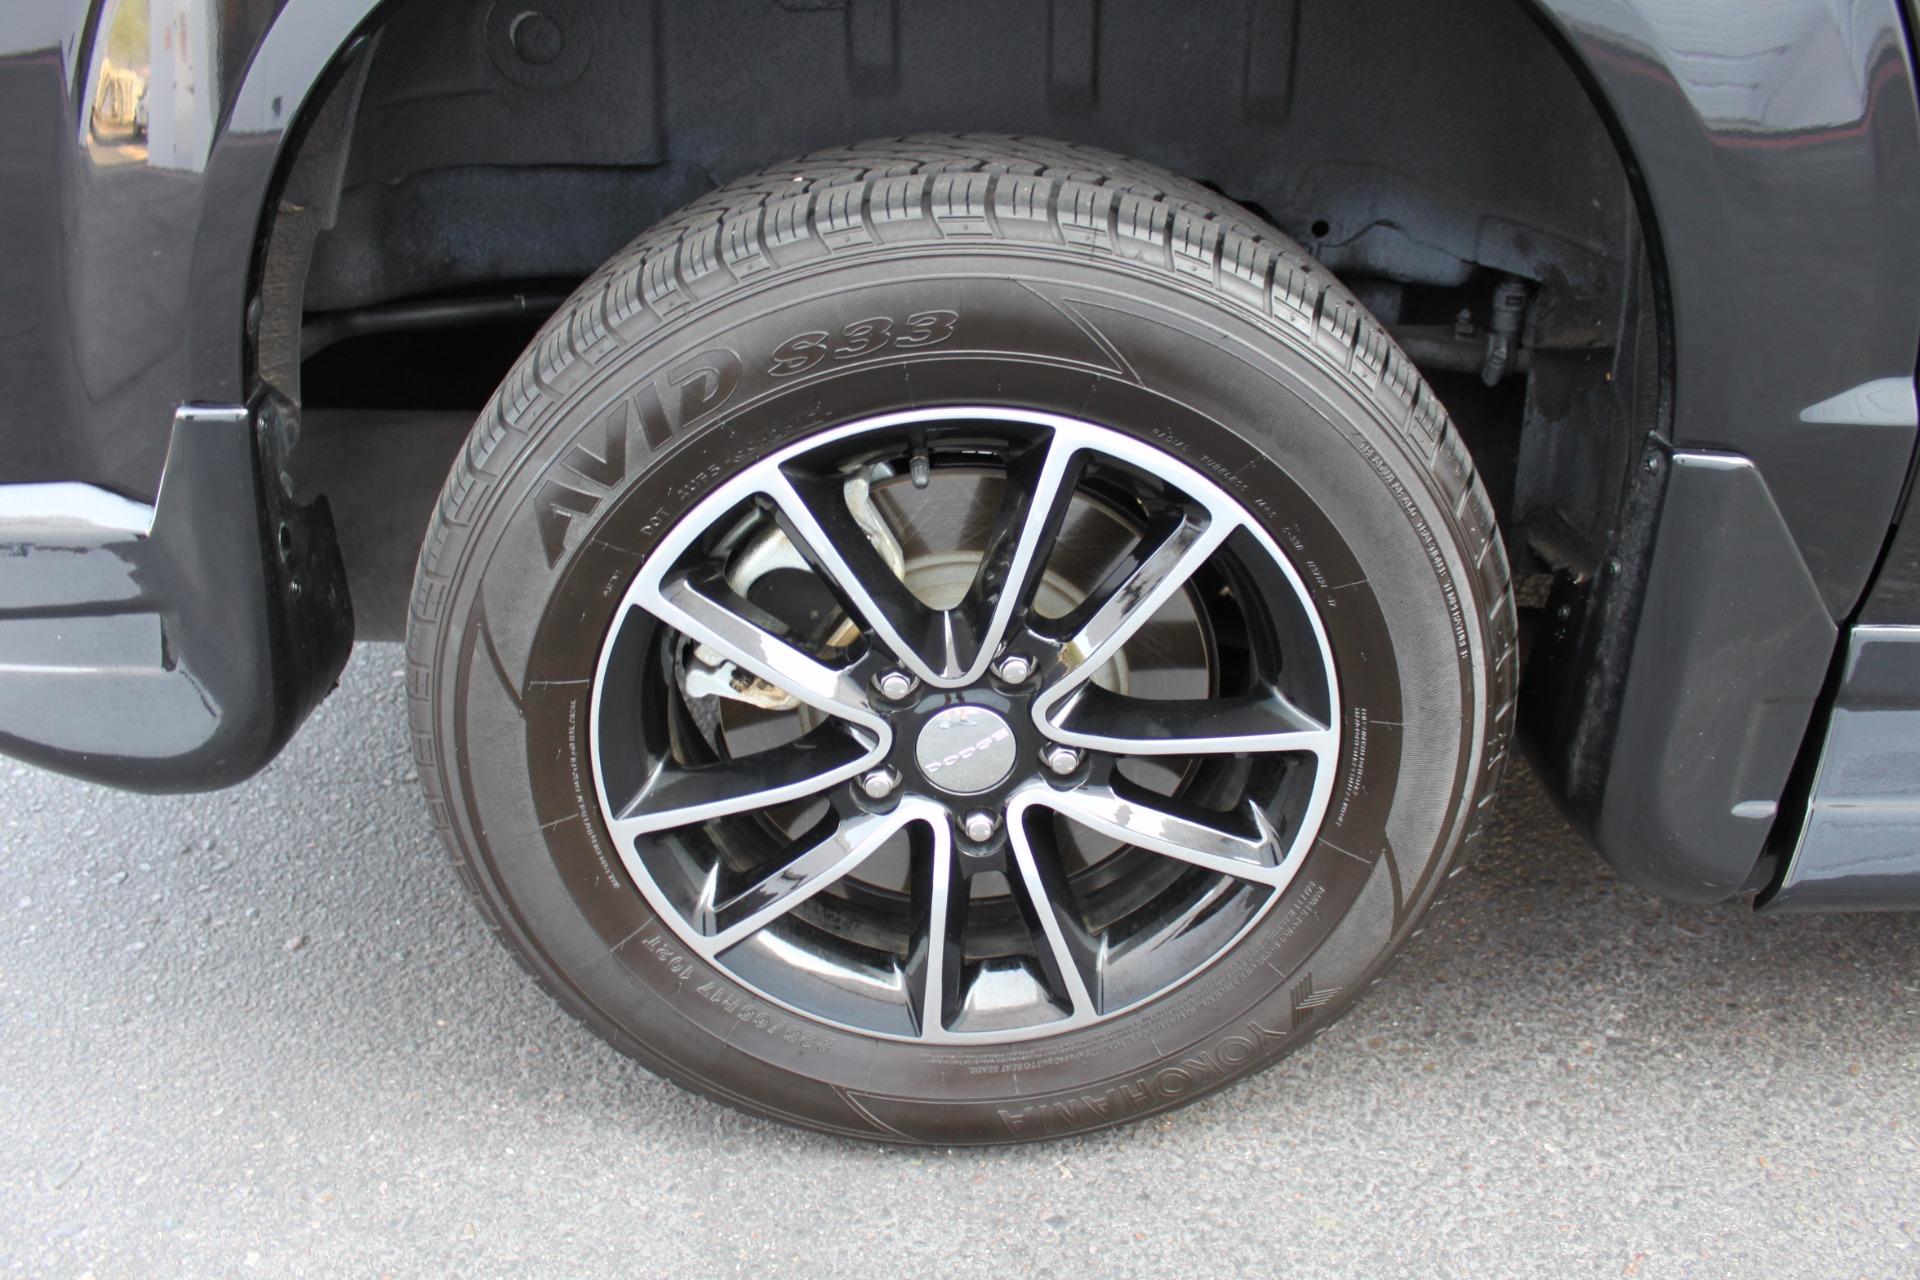 Used-2018-Dodge-Grand-Caravan-SXT-Rollx-Mobility-Conversion-Chalenger